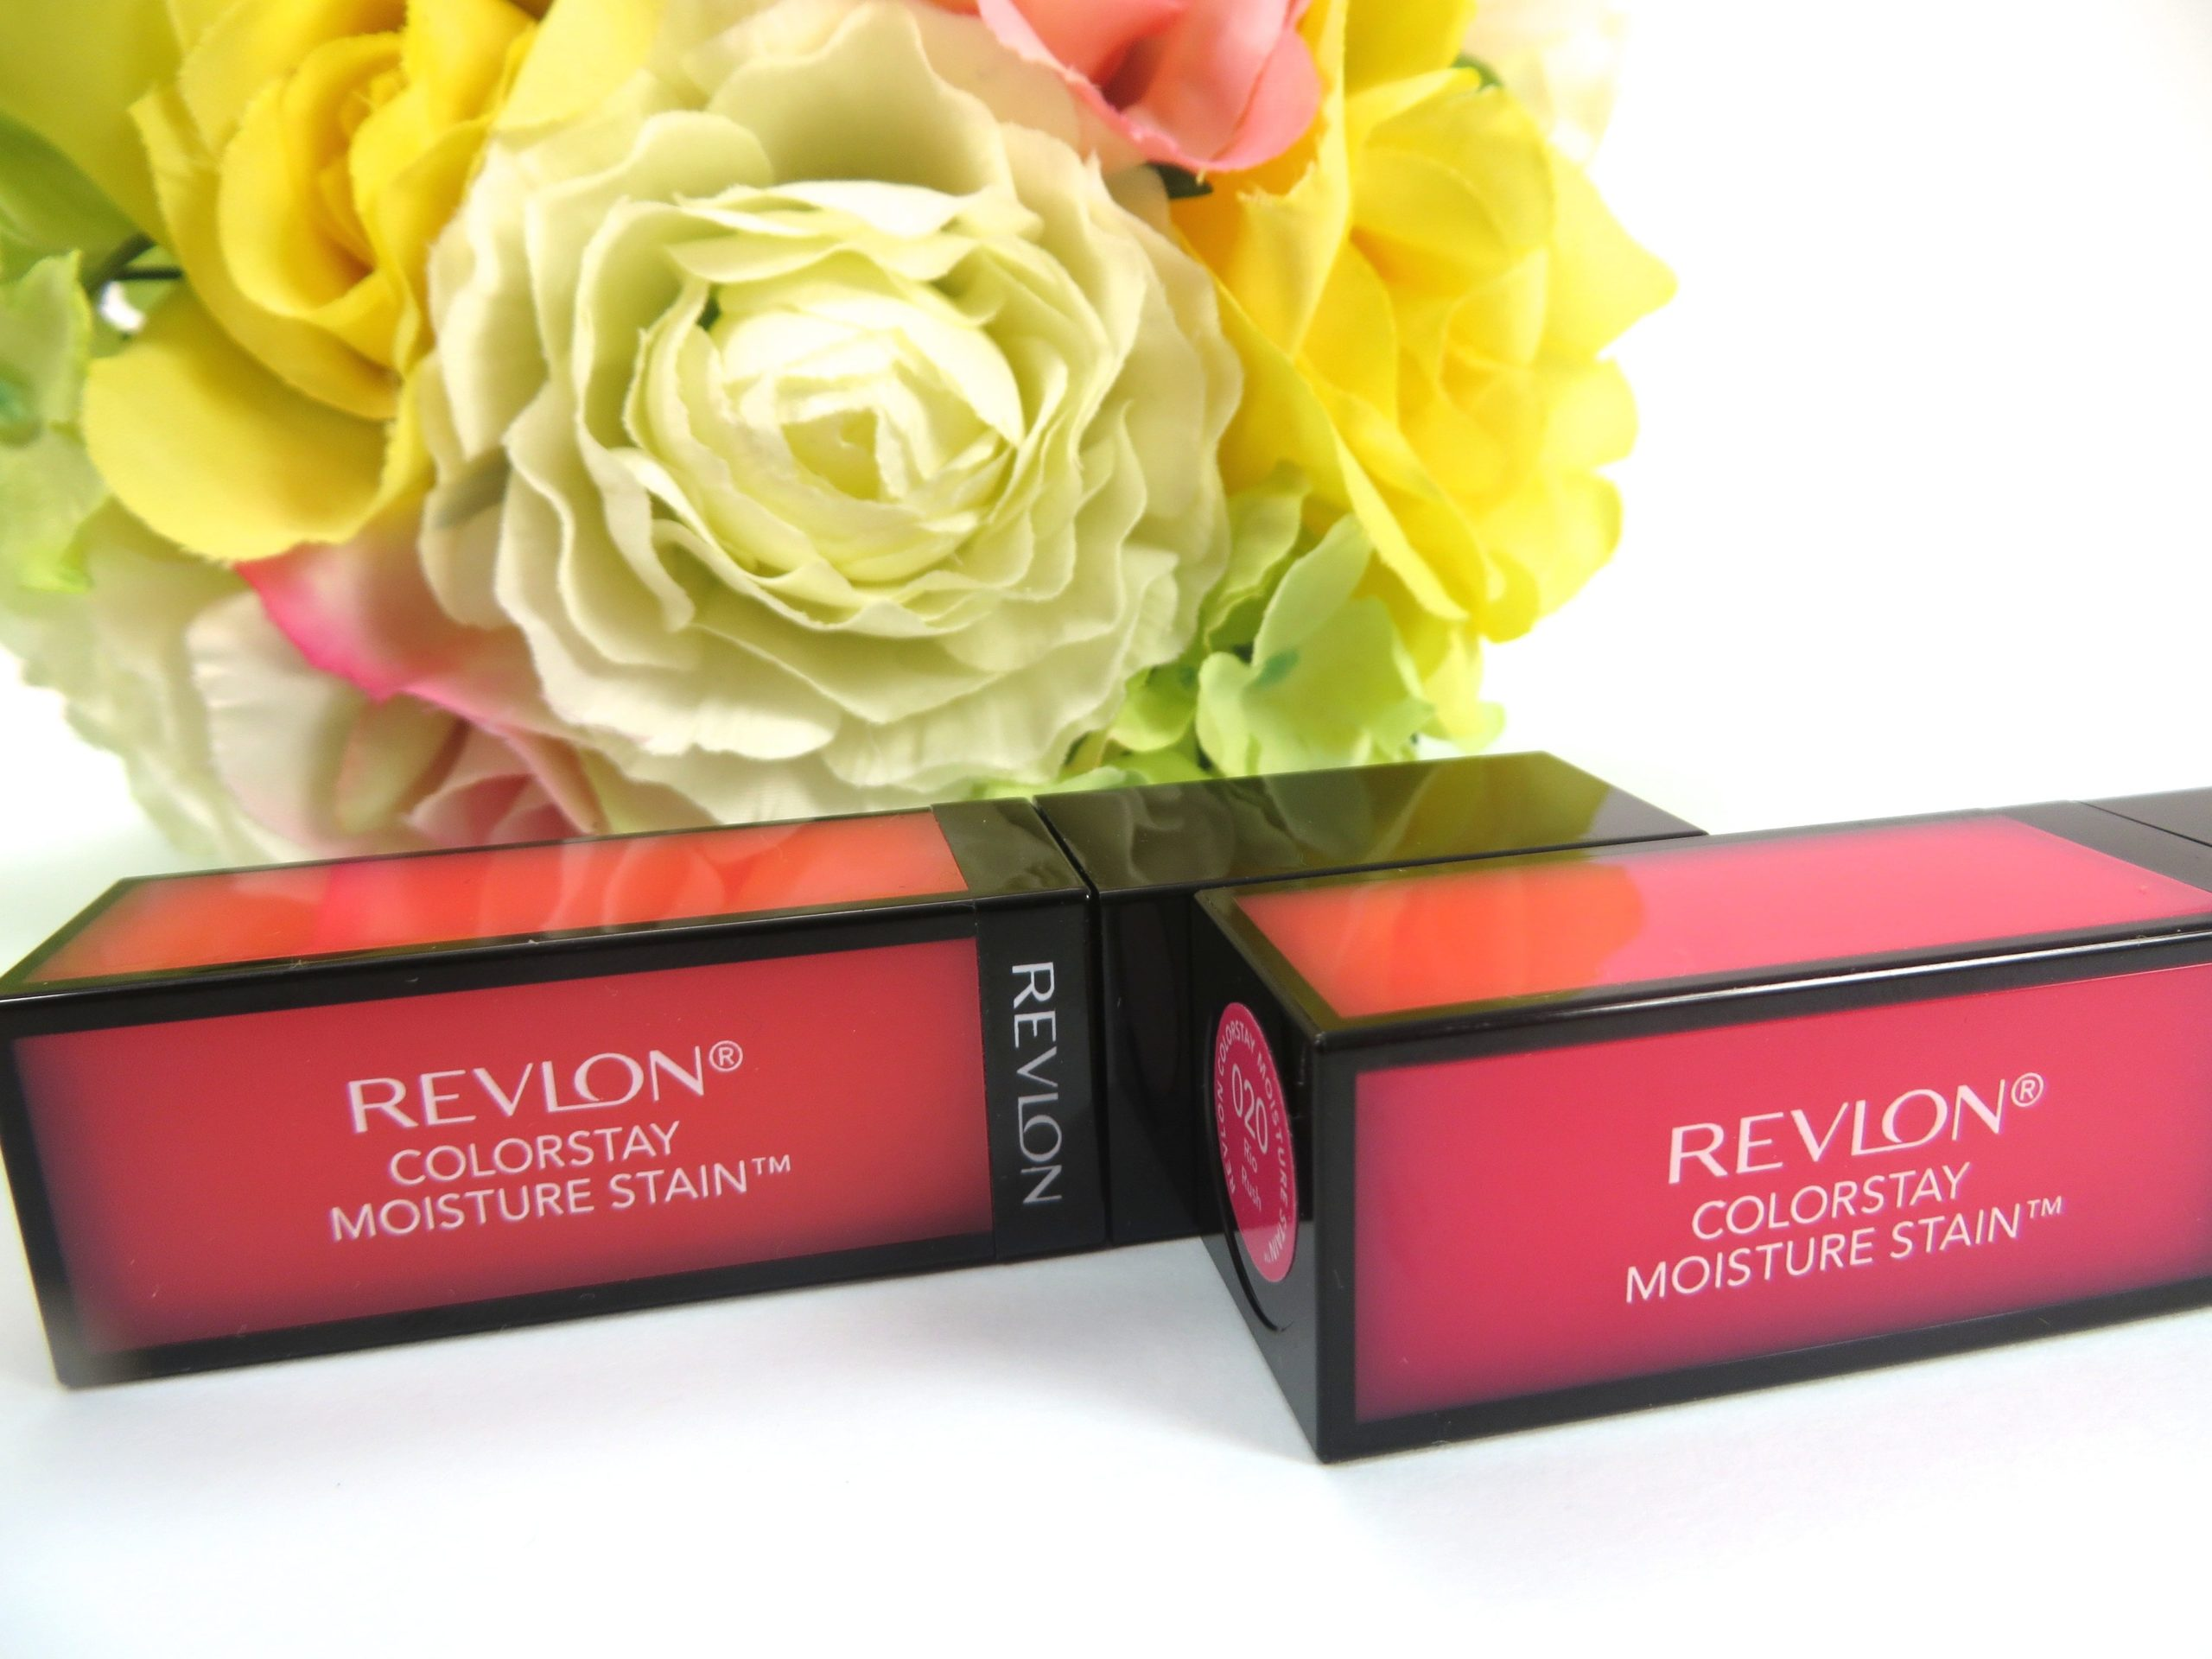 Revlon Colorstay Moisture Stain Review